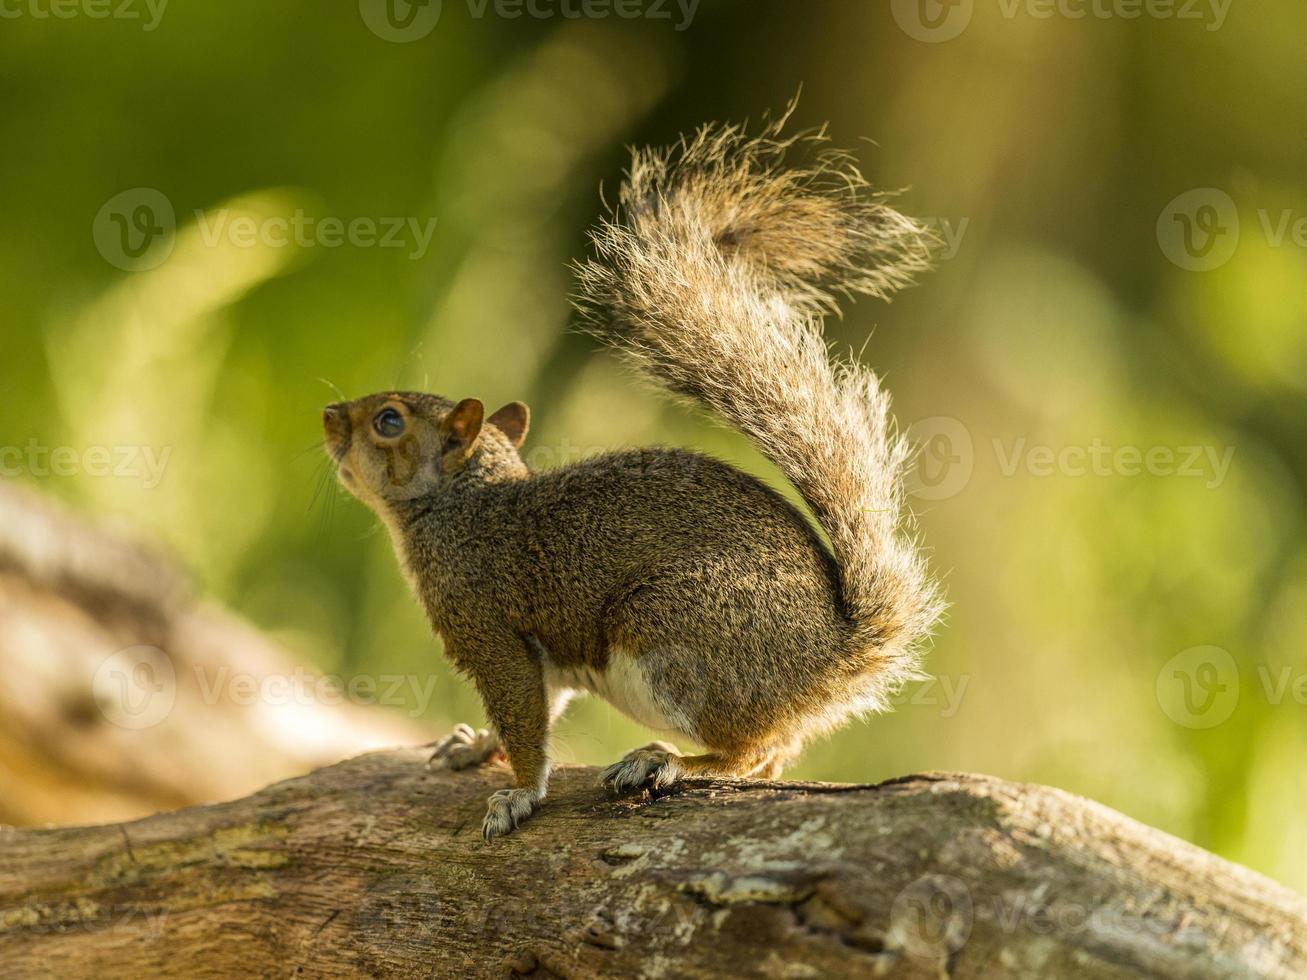 écureuil gris (sciurus carolinensis) photo